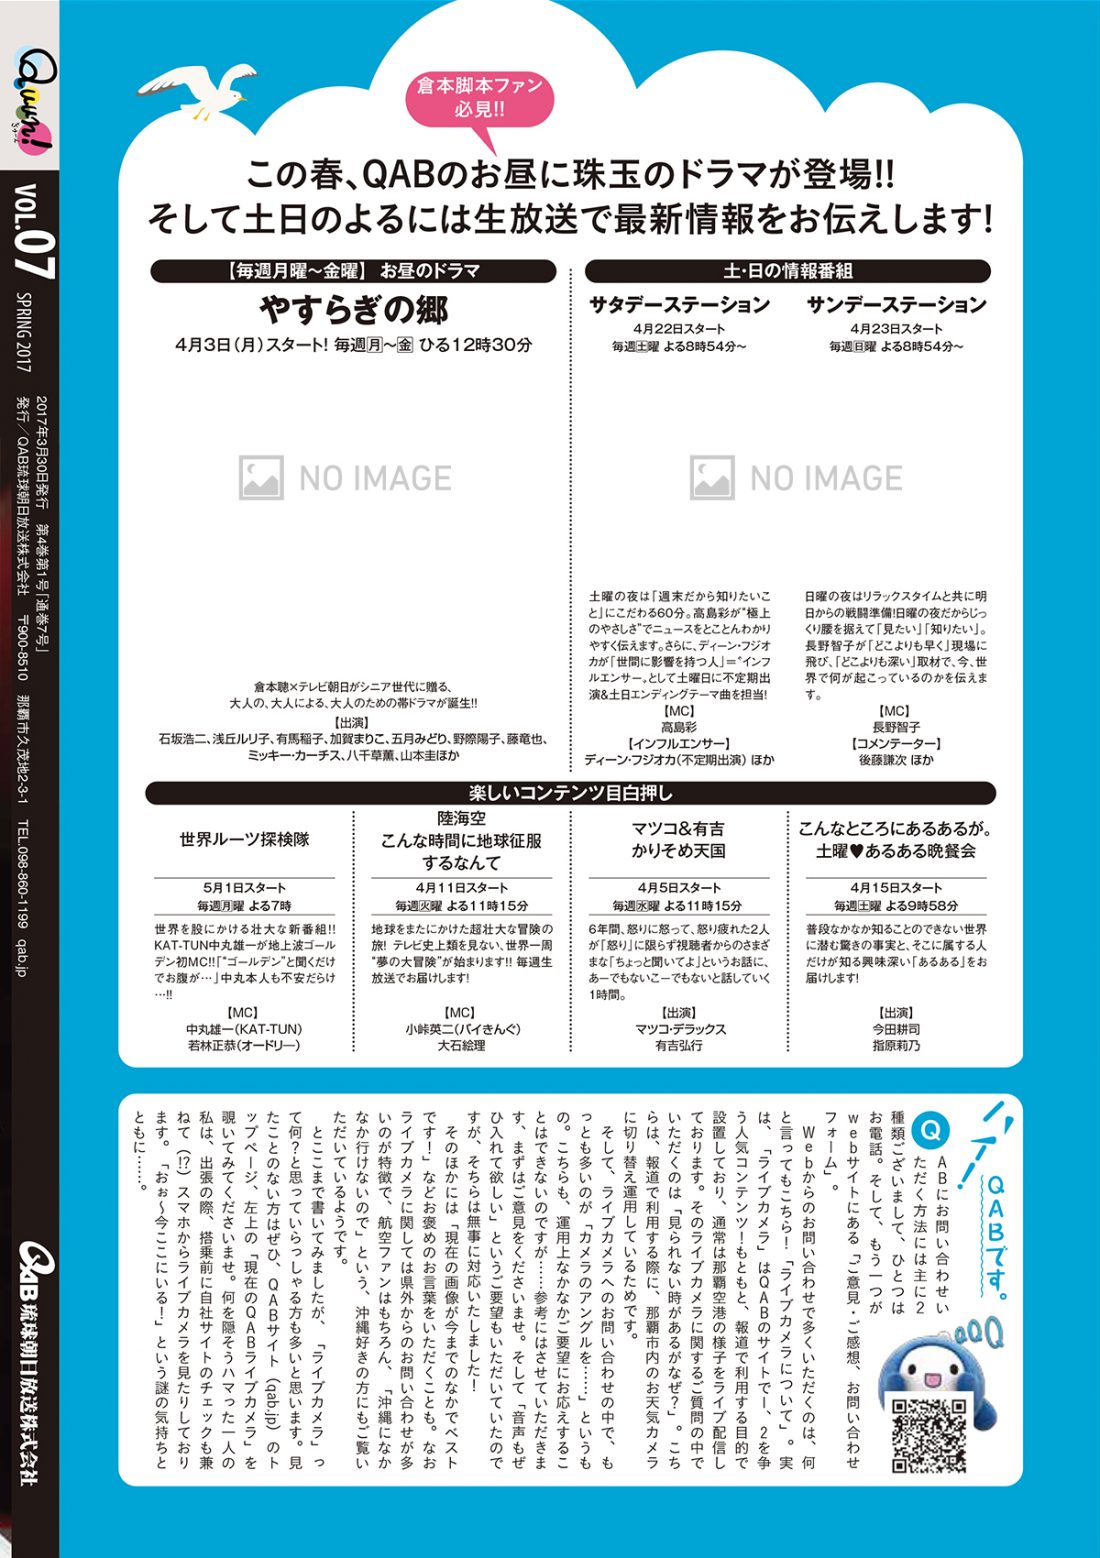 https://www.qab.co.jp/qgoro/wp-content/uploads/quun_0716-1100x1558.jpg